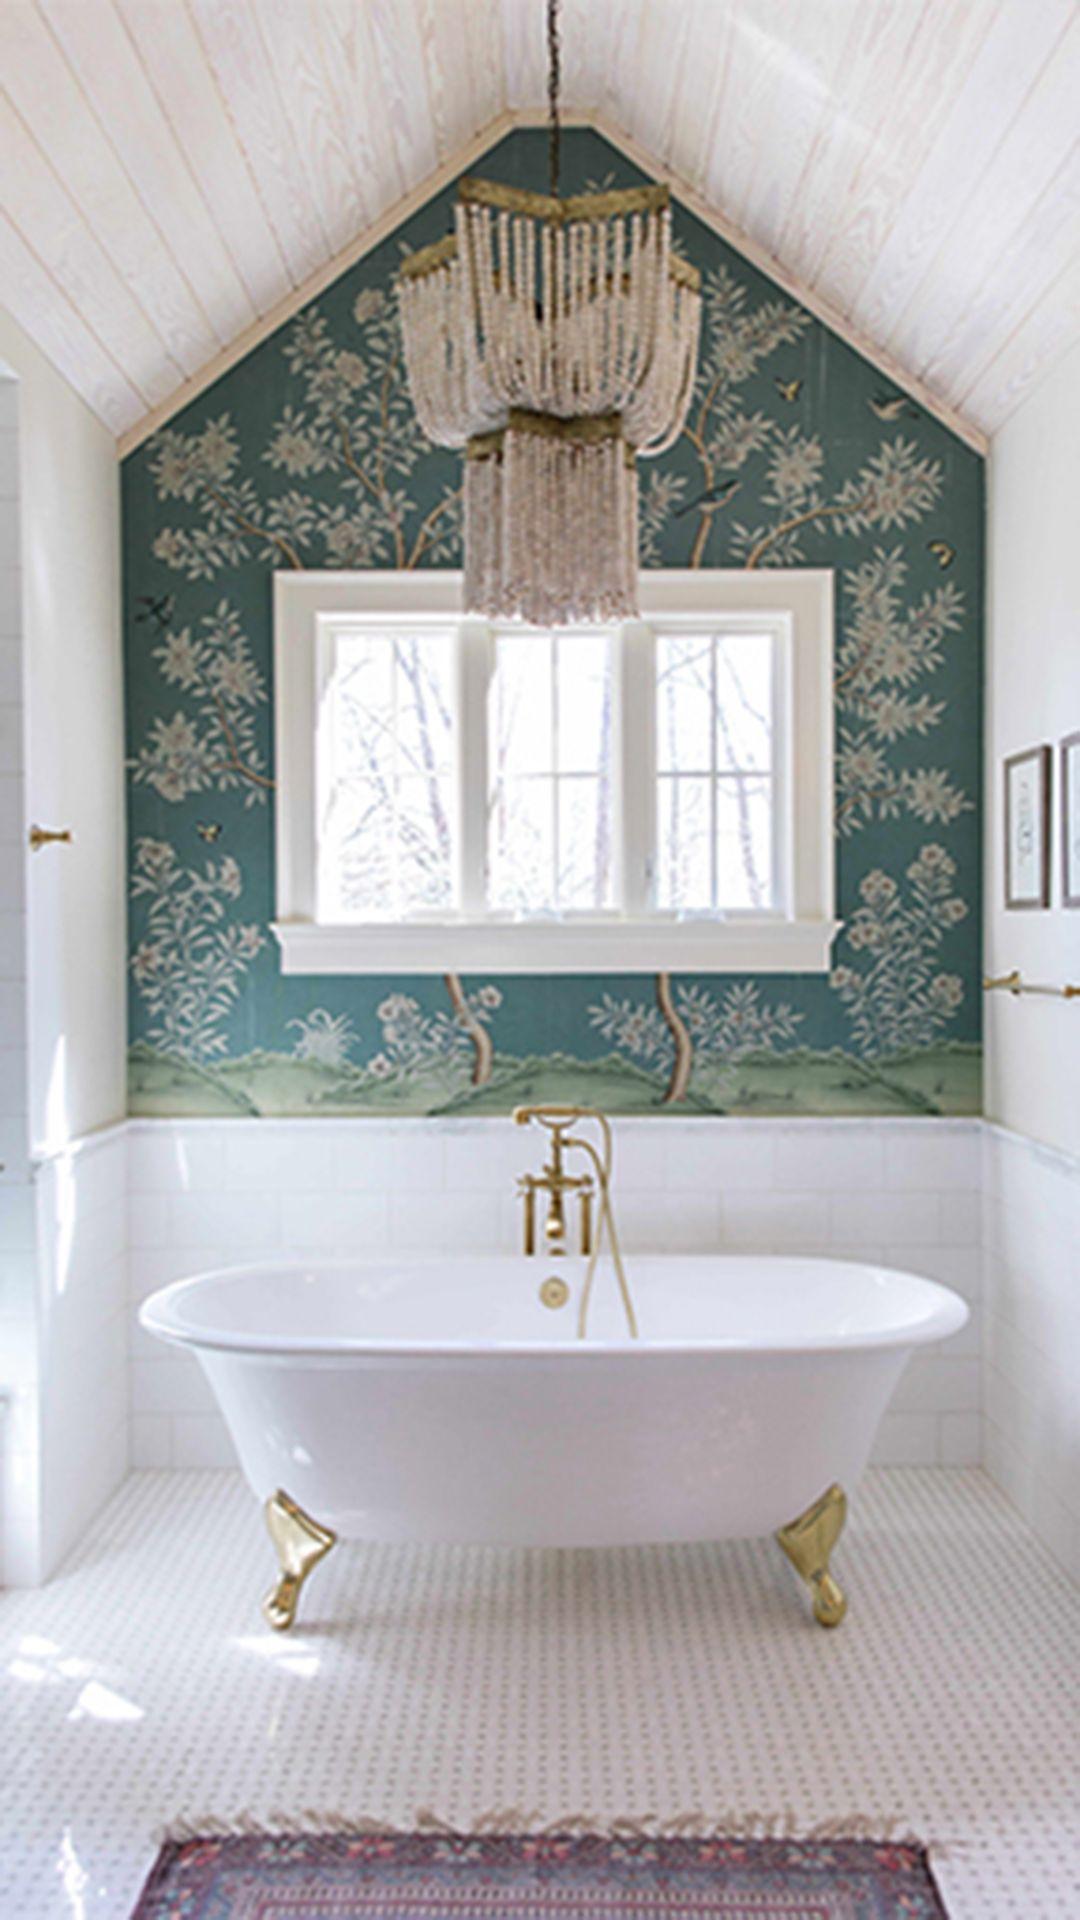 Soak It In 10 Beautiful Bathrooms Designed For Relaxation The Scout Guide Beautiful Bathrooms Bathroom Decor Bathroom Inspiration